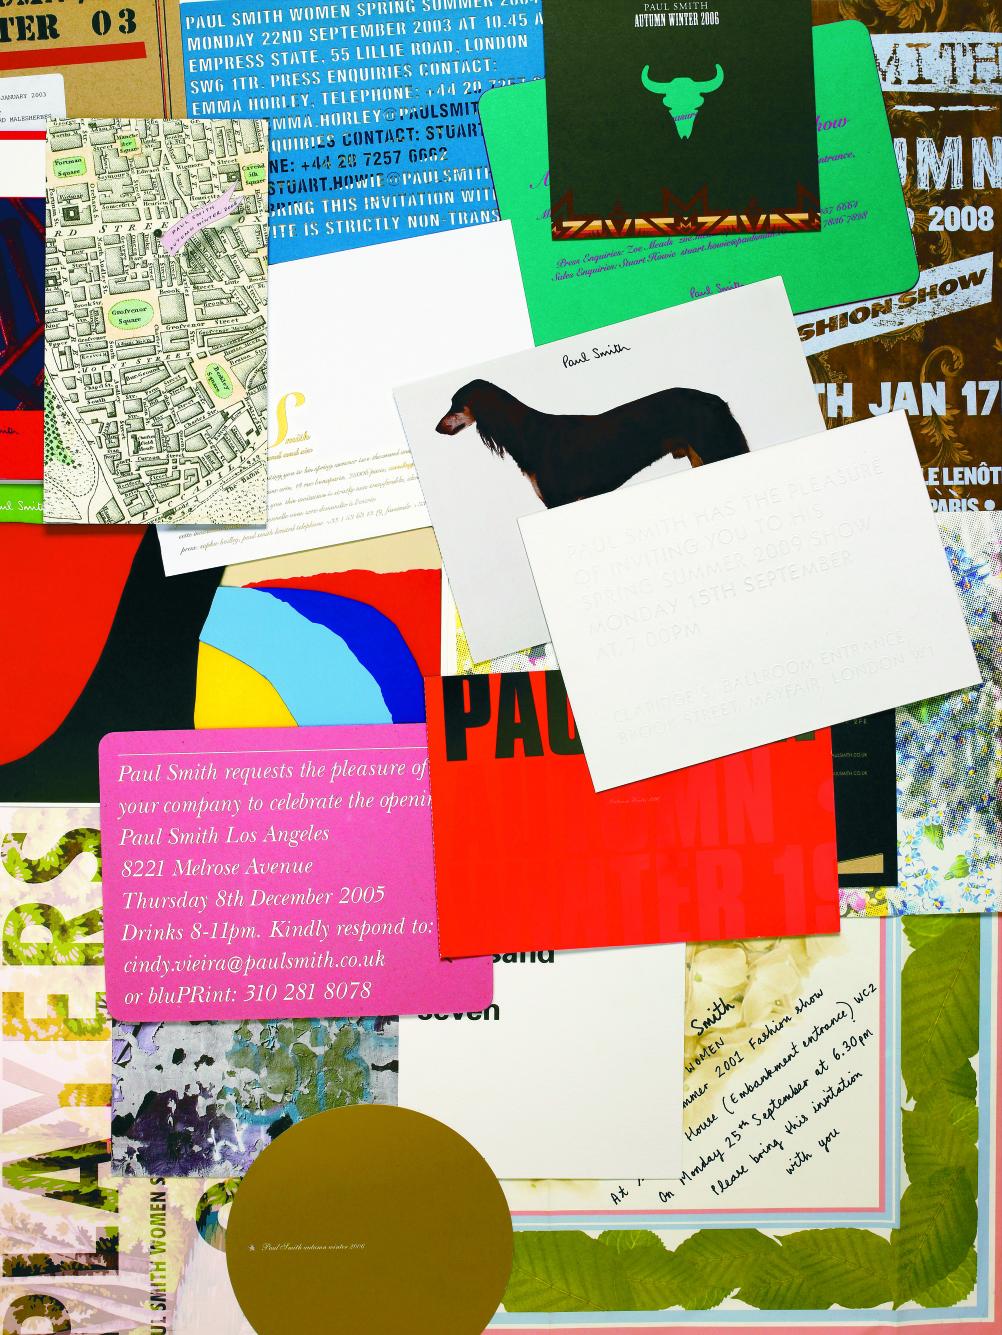 Aboud Creative for Paul Smith